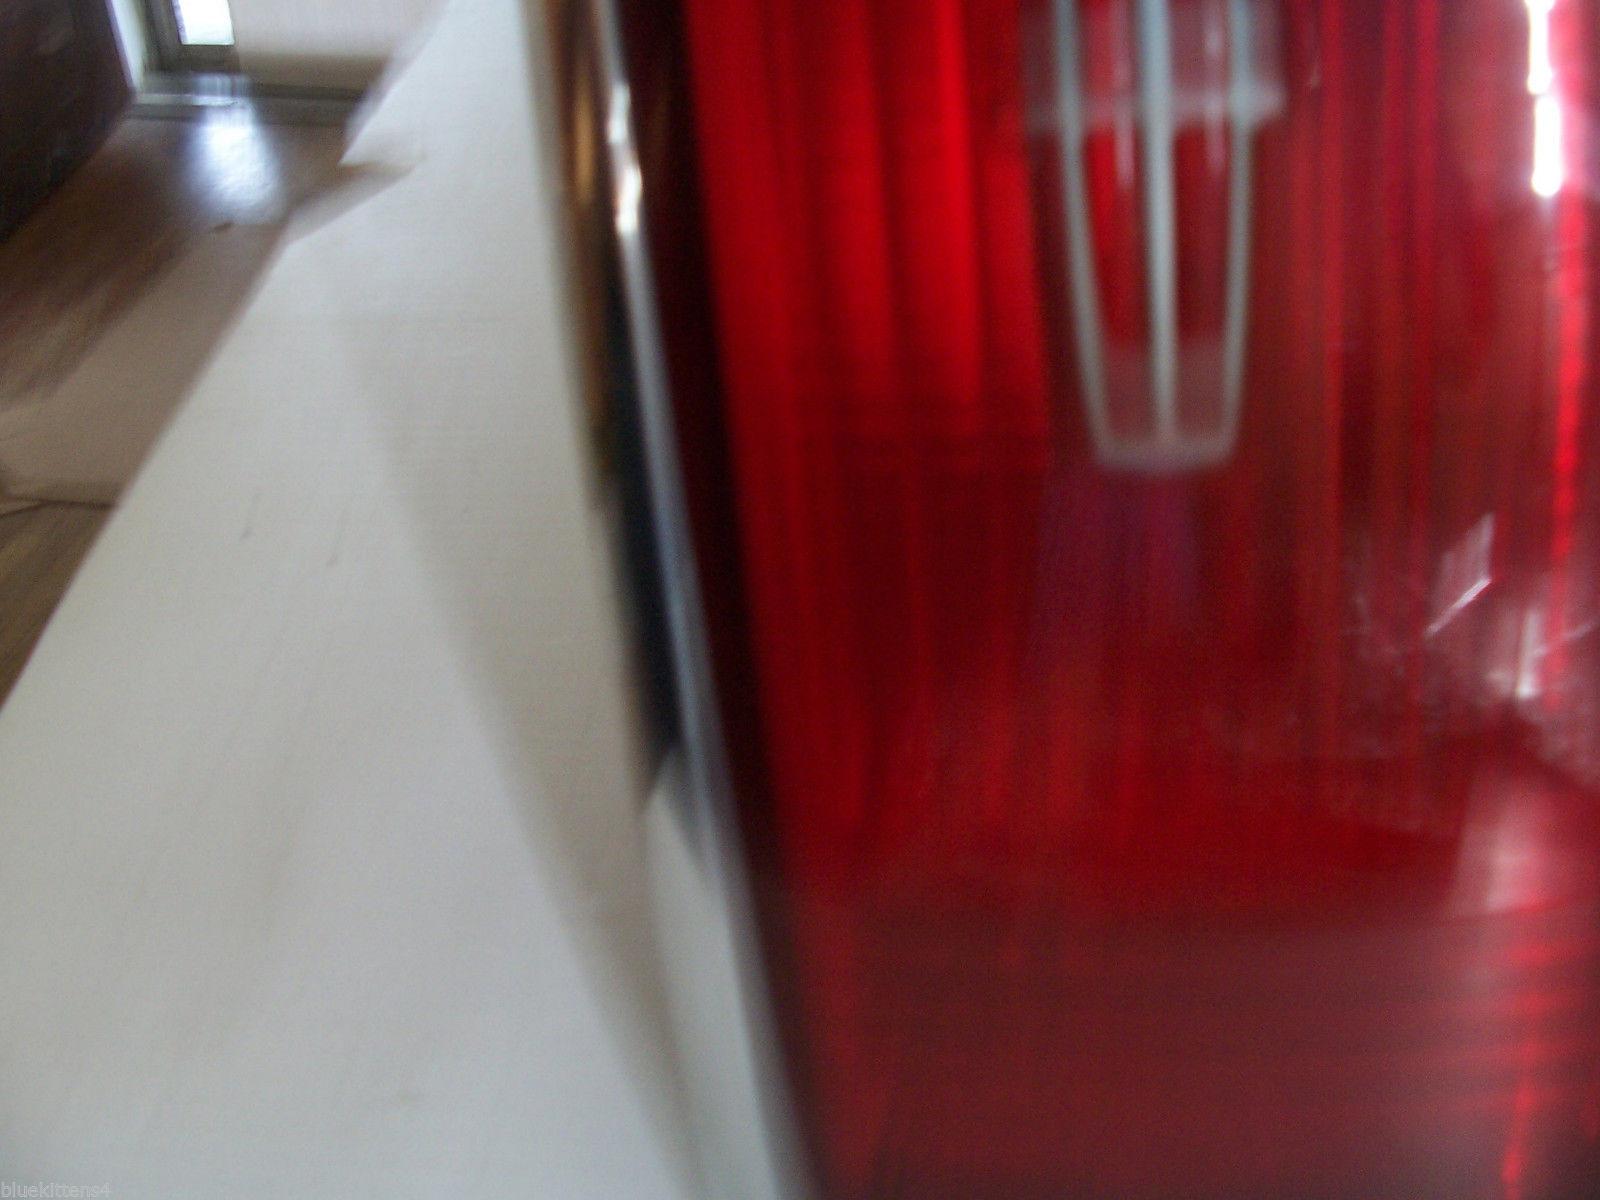 1995 1997 TOWNCAR RIGHT TAILLIGHT TURN BRAKE SIGNAL OEM USED ORIGINAL LINCOLN